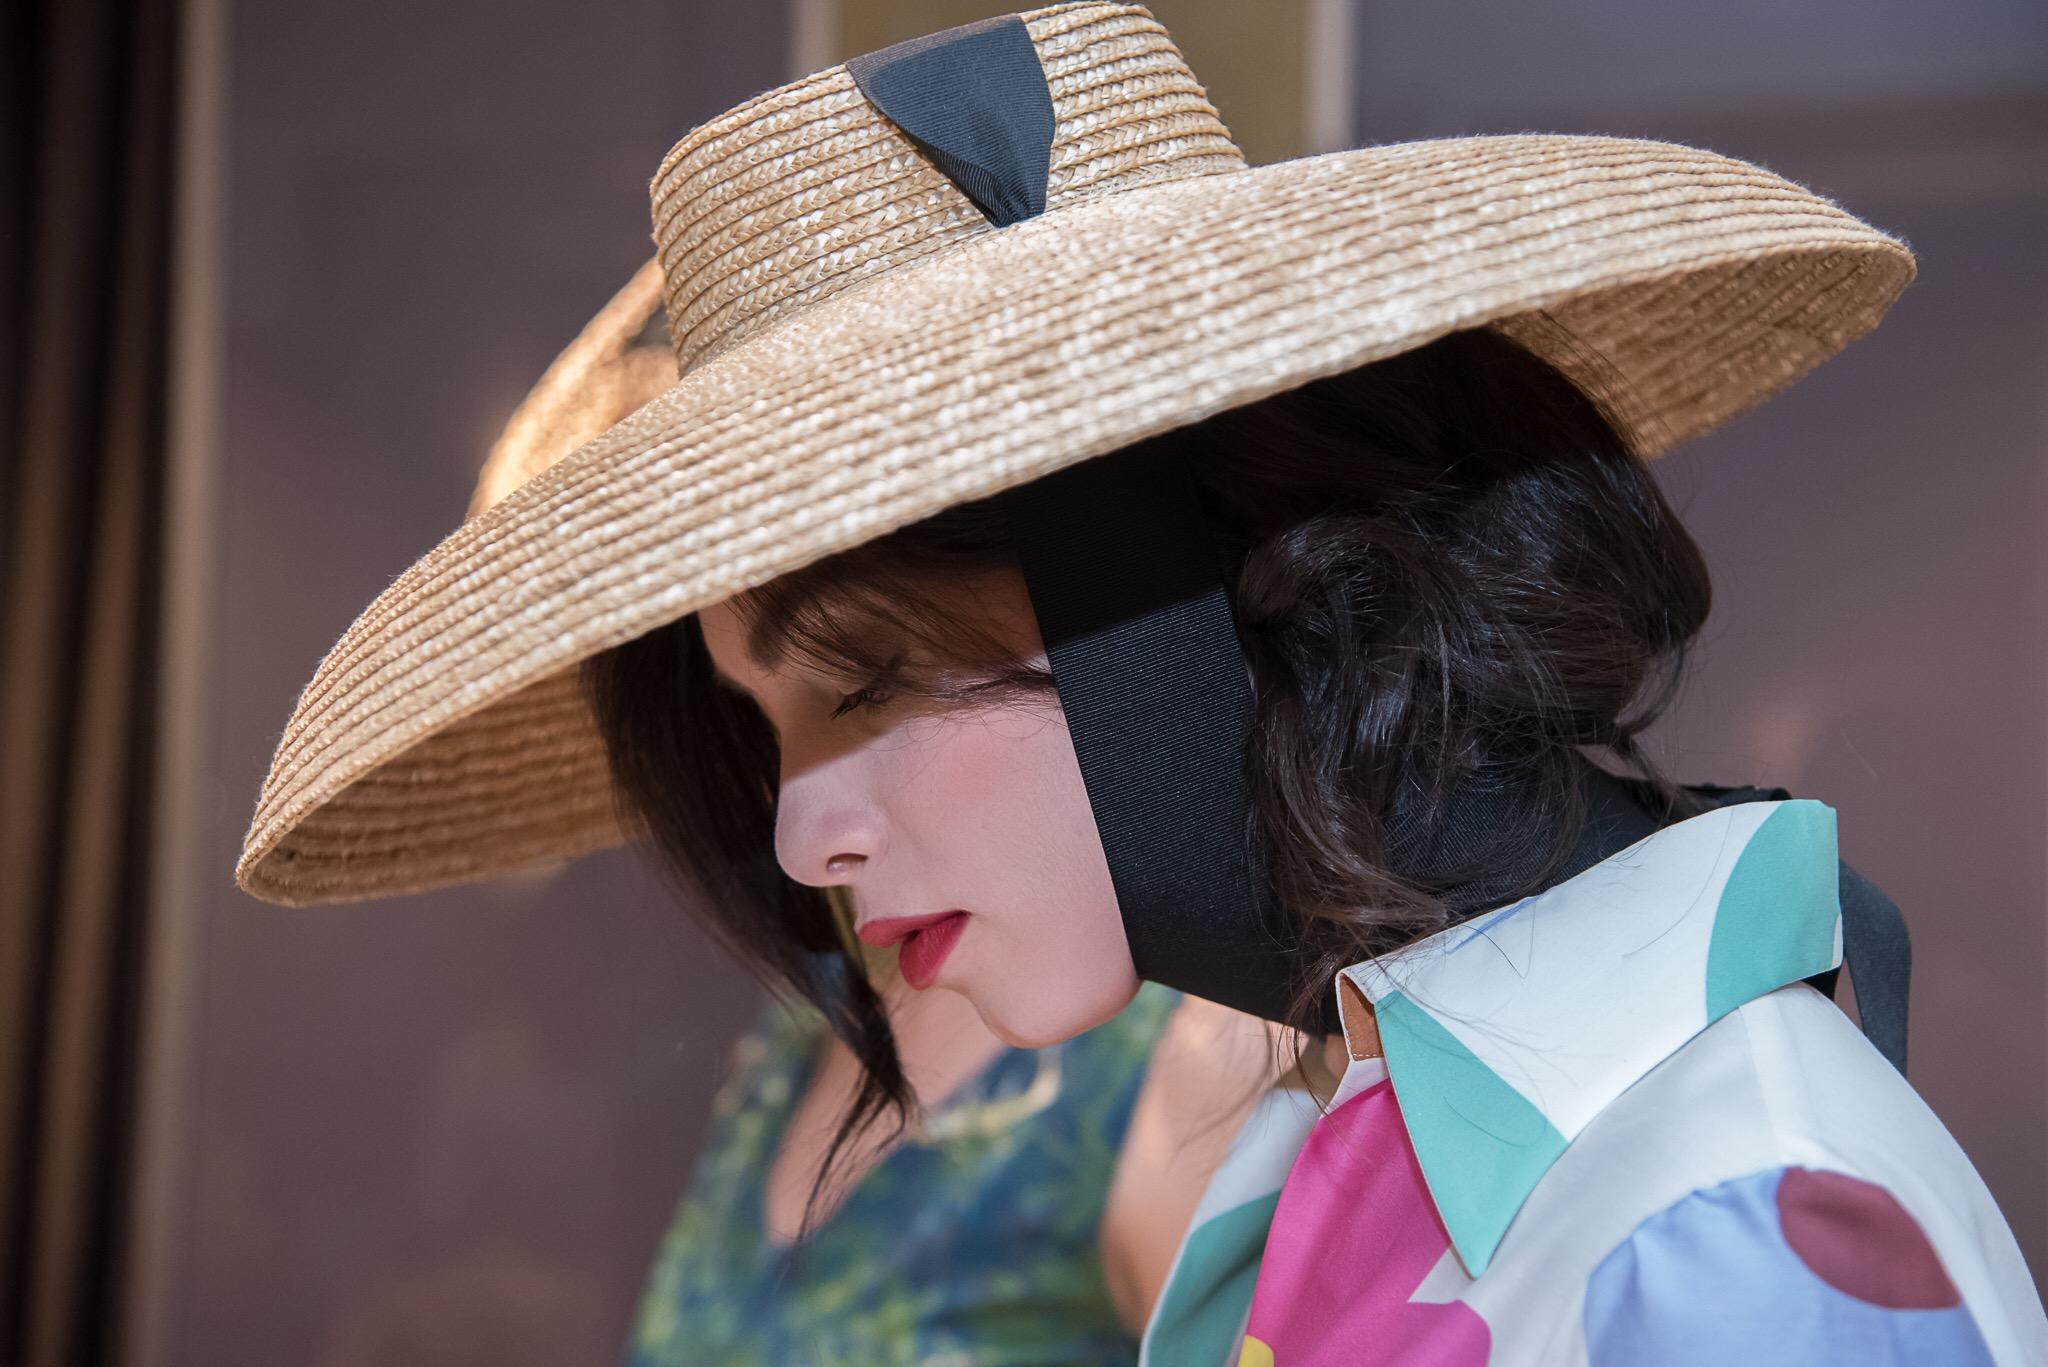 Venice Fashion Week